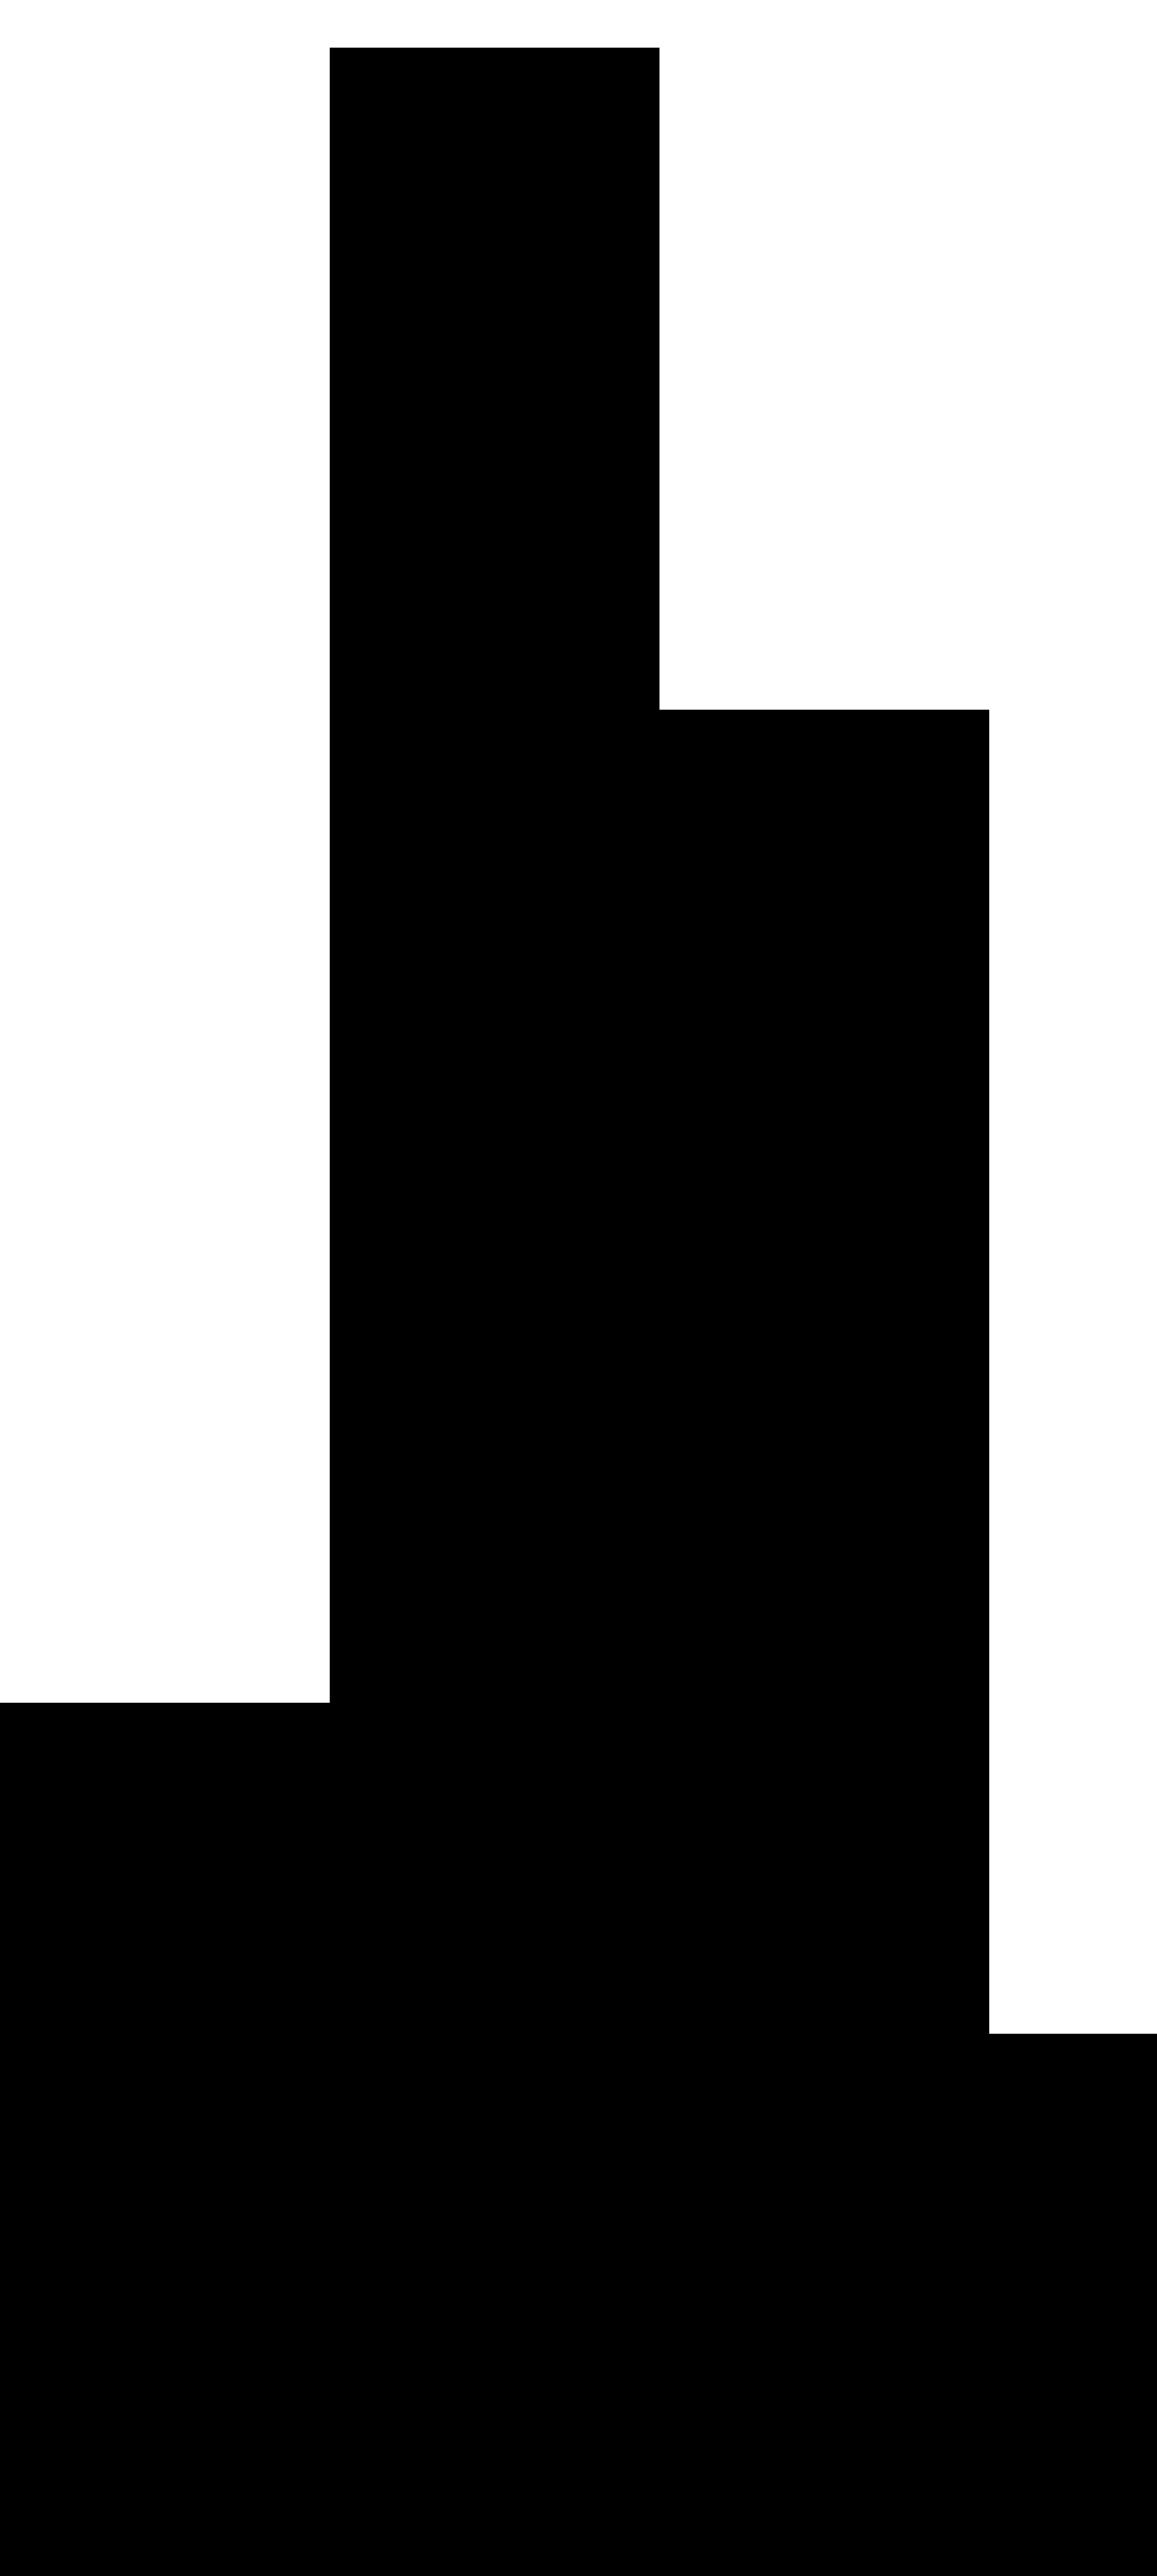 Eiffel tower transparent png. Ladybug clipart silhouette